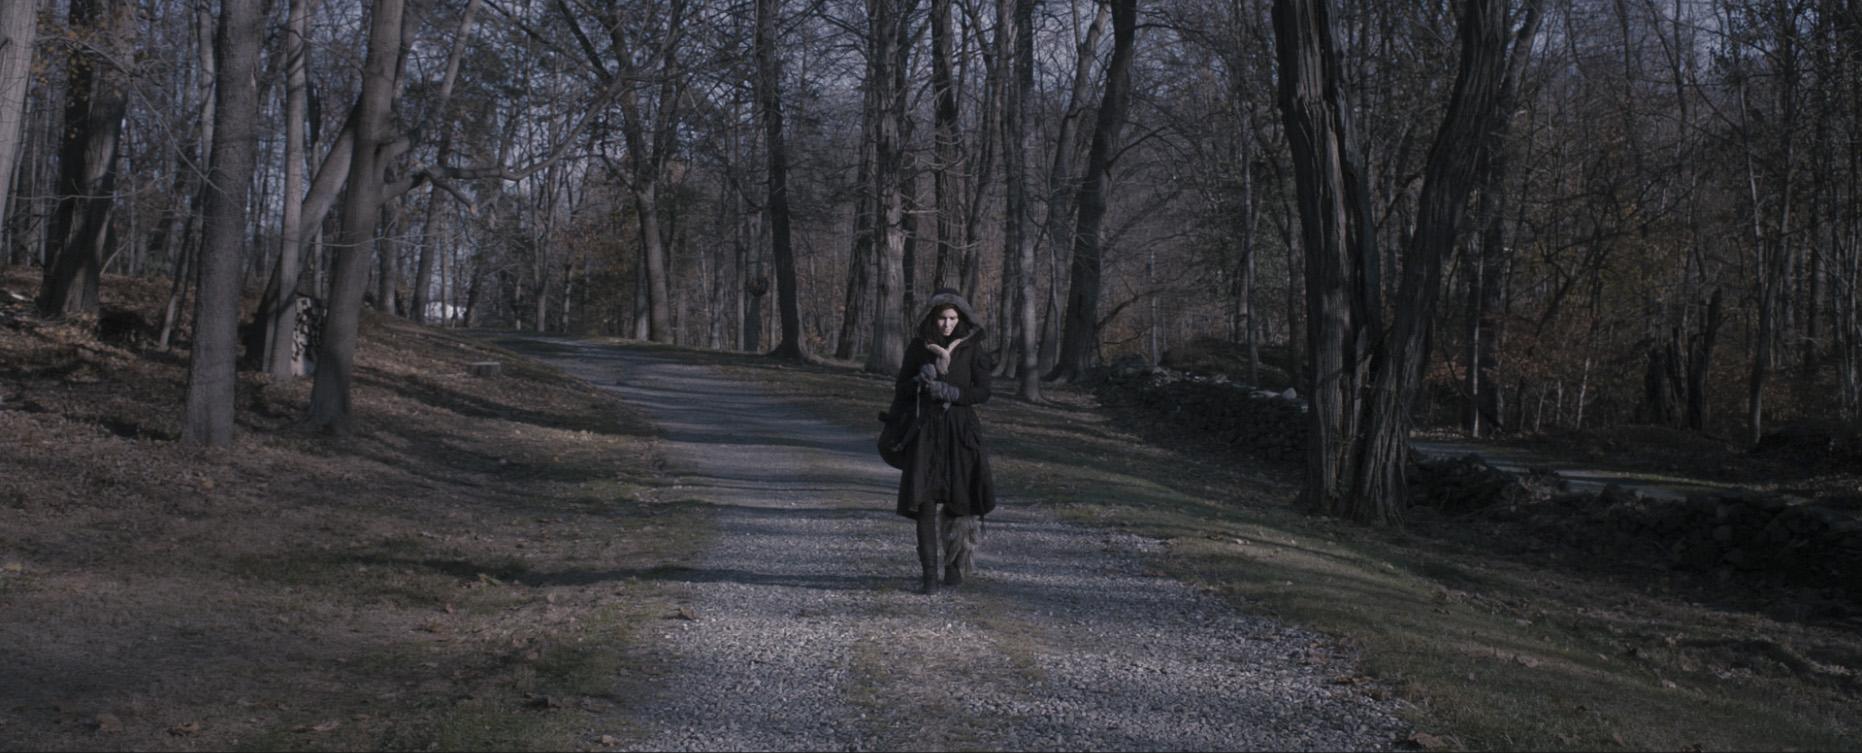 01_Asenna_walking_1.jpg